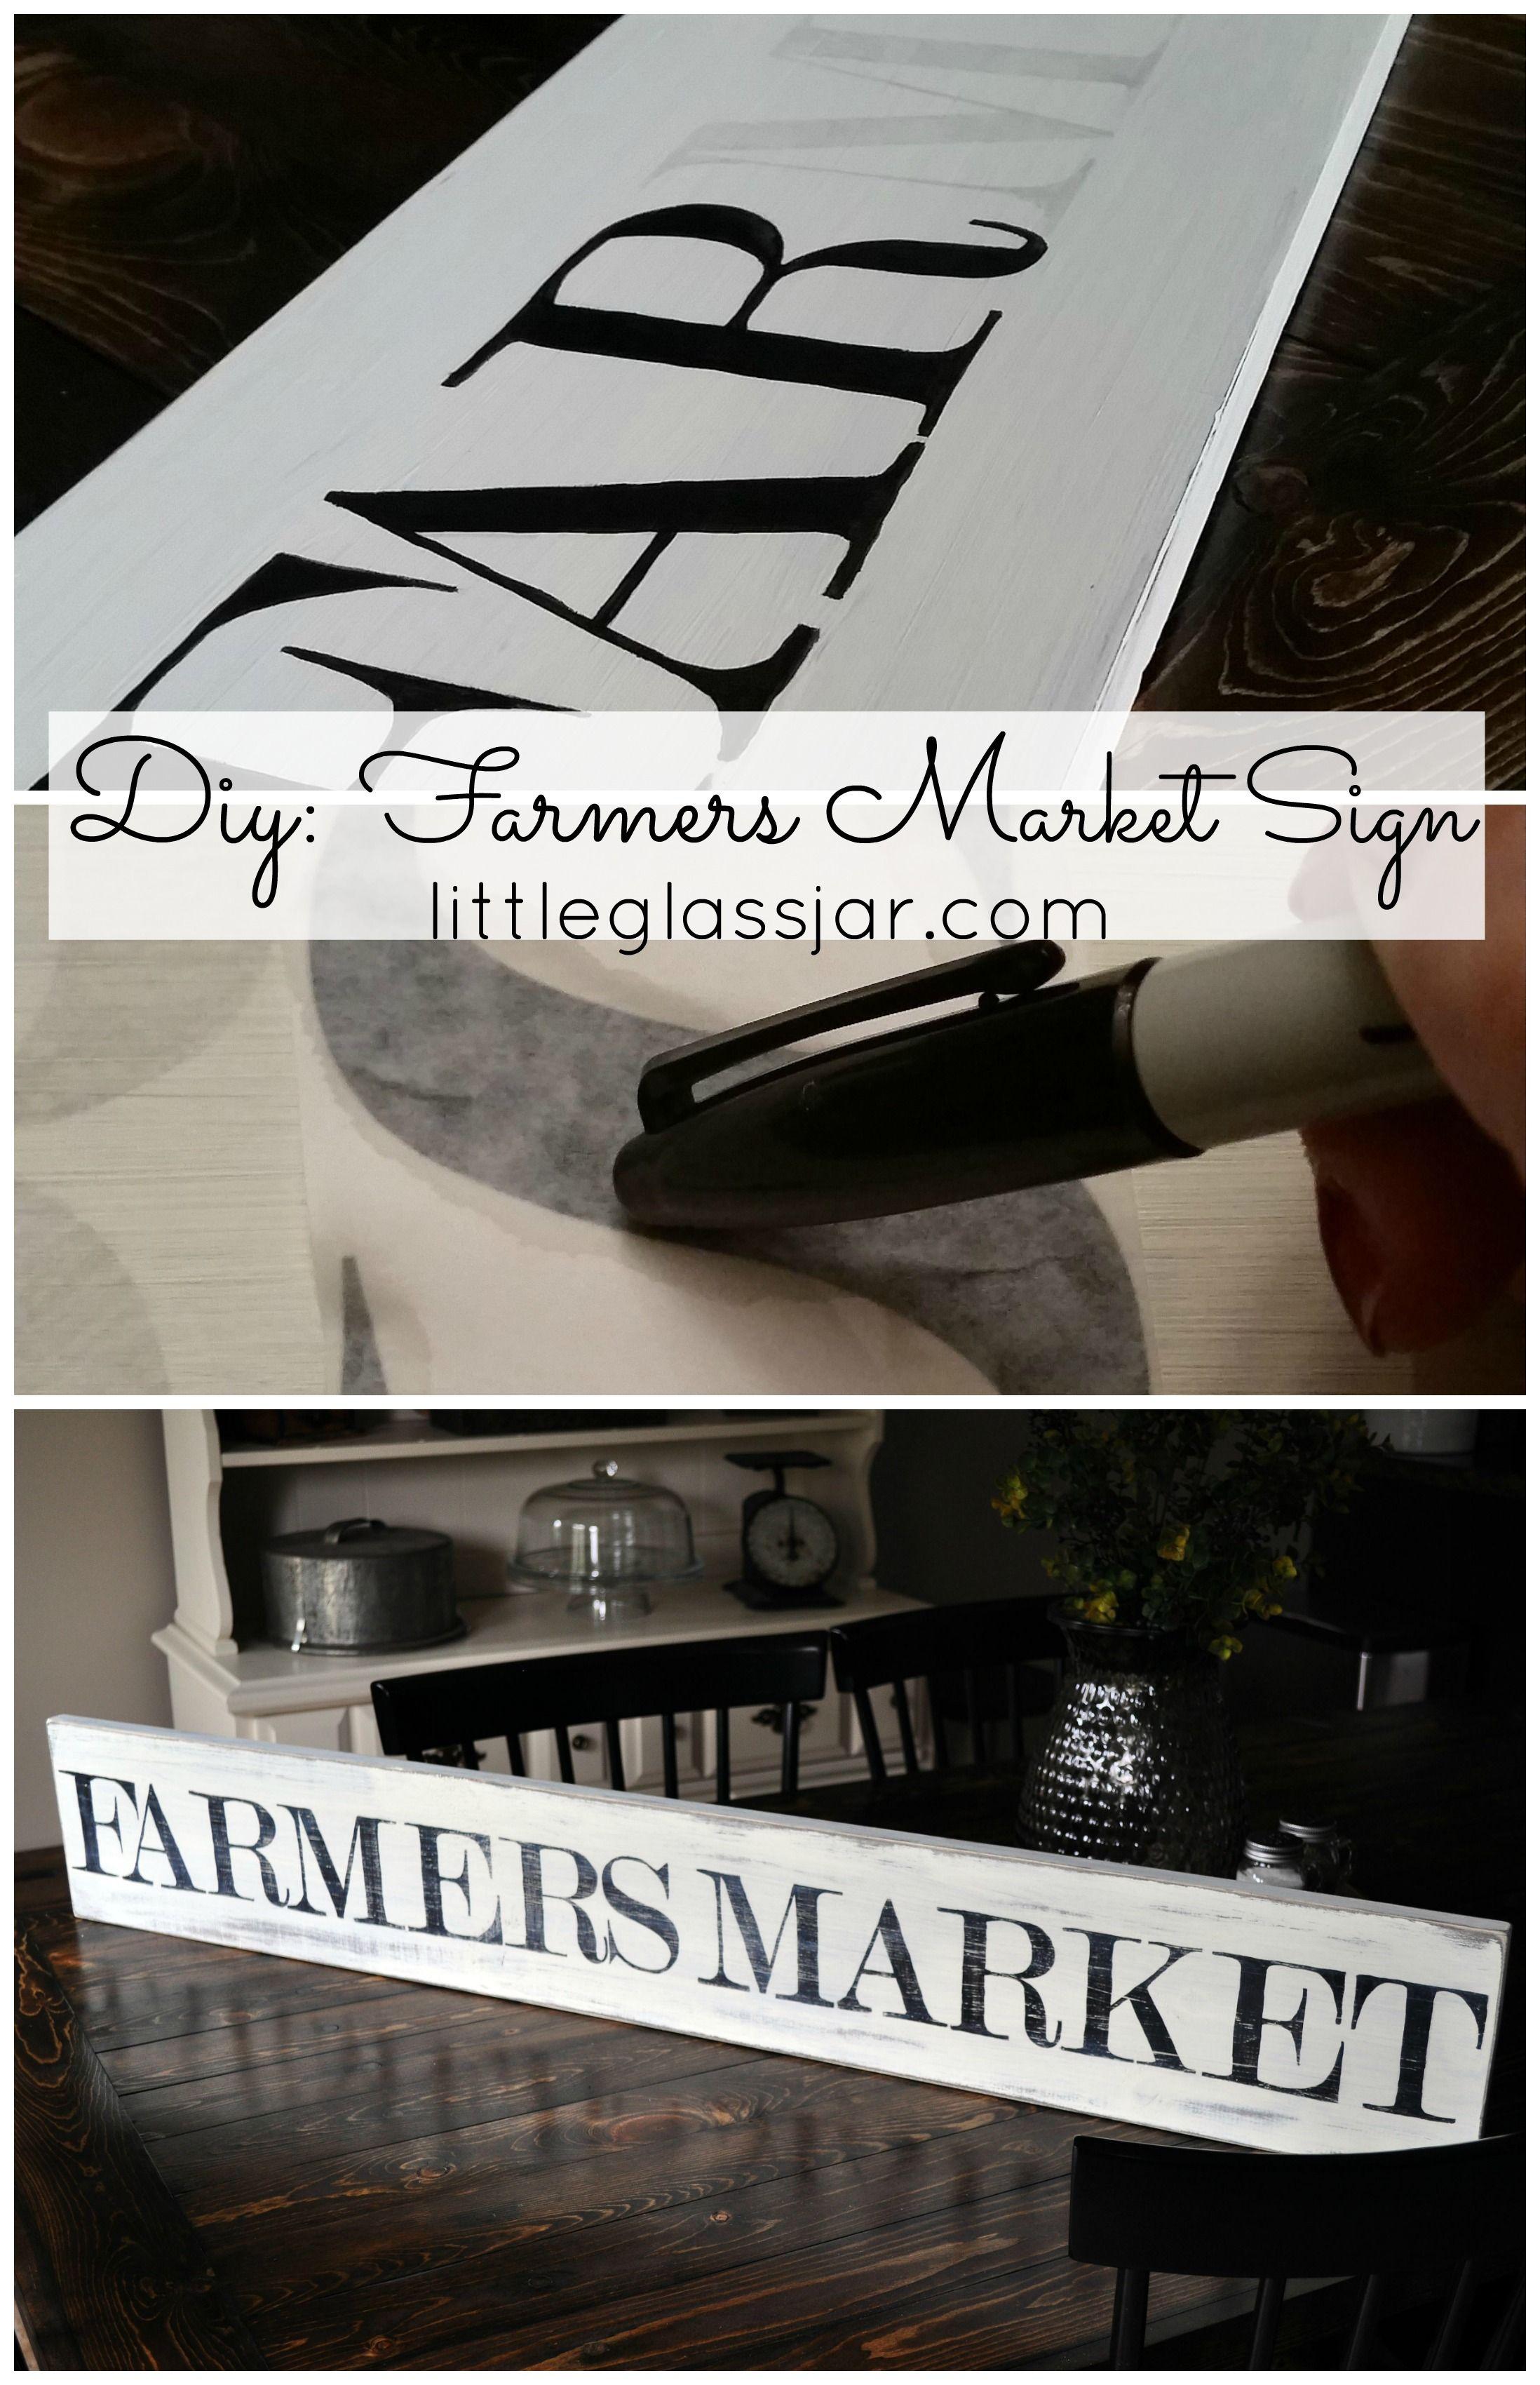 Farmers Market Sign Kitchen sign diy, Farmers market